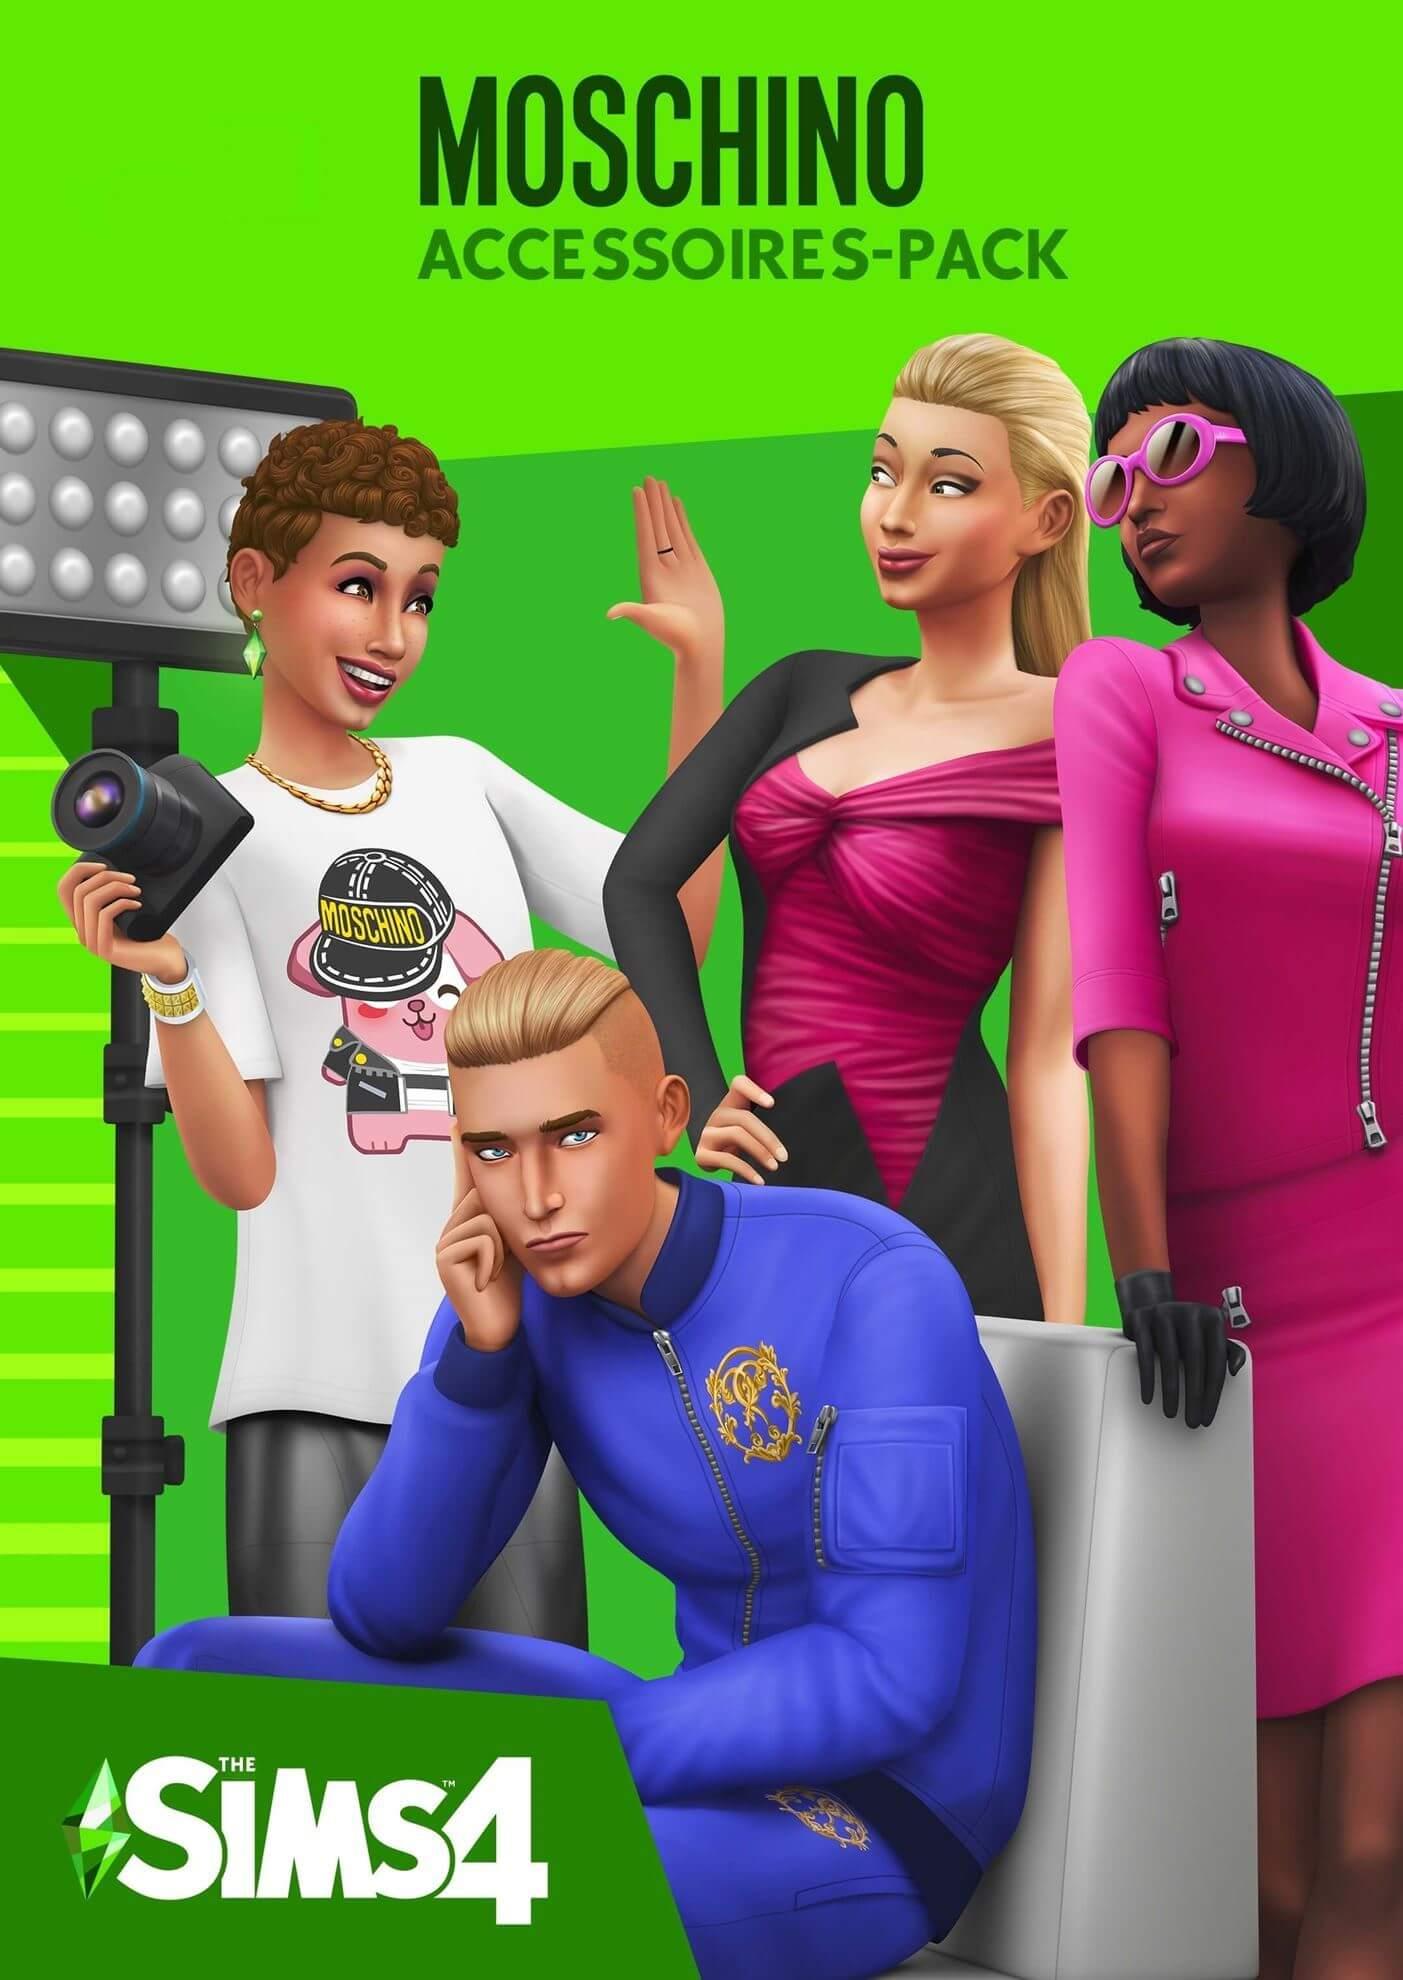 The Sims™ 4: Moschino Stuff Pack